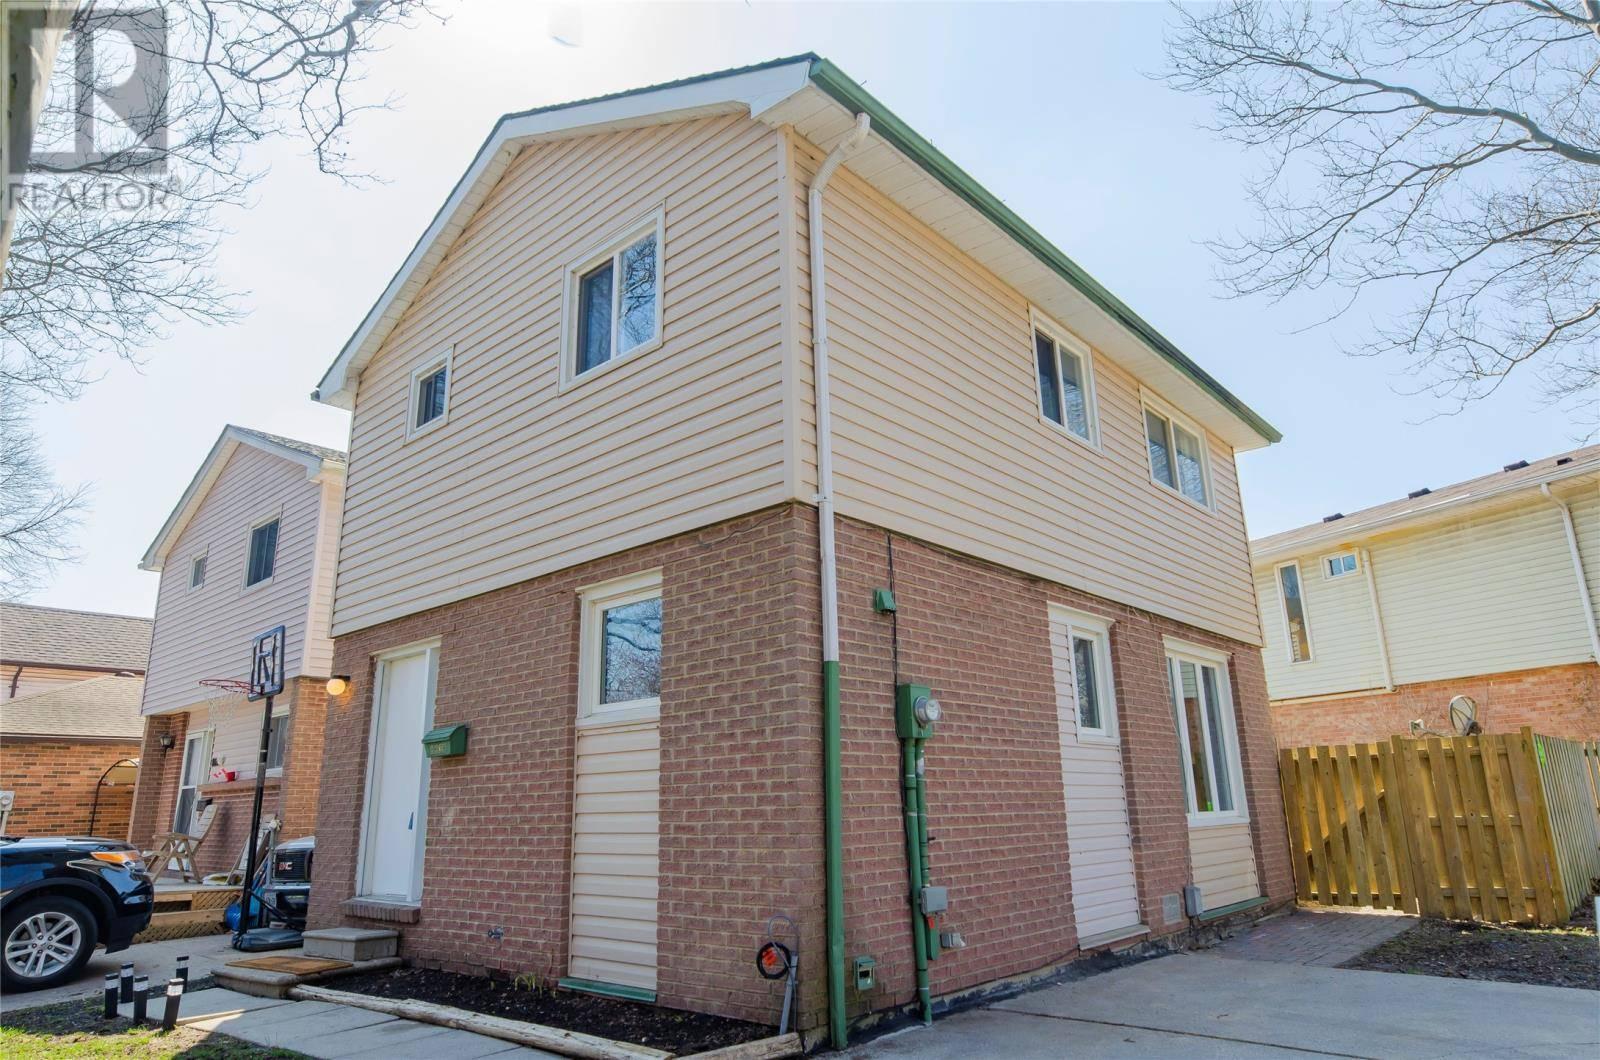 House for sale at 8639 Darlington  Windsor Ontario - MLS: 20003876